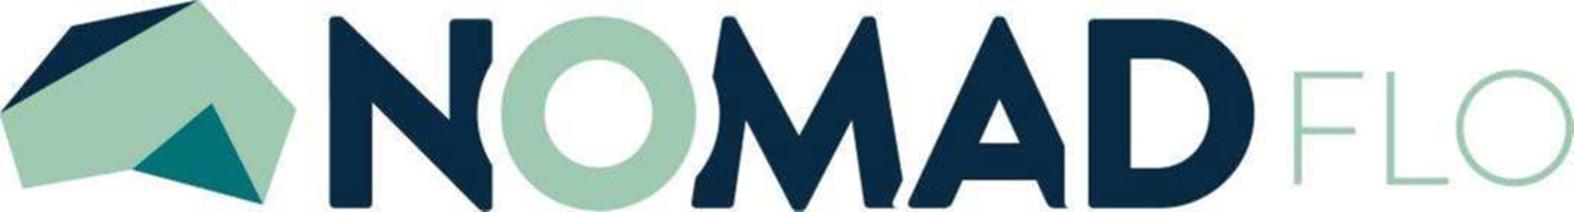 Nomad-Flo-Logo.jpg